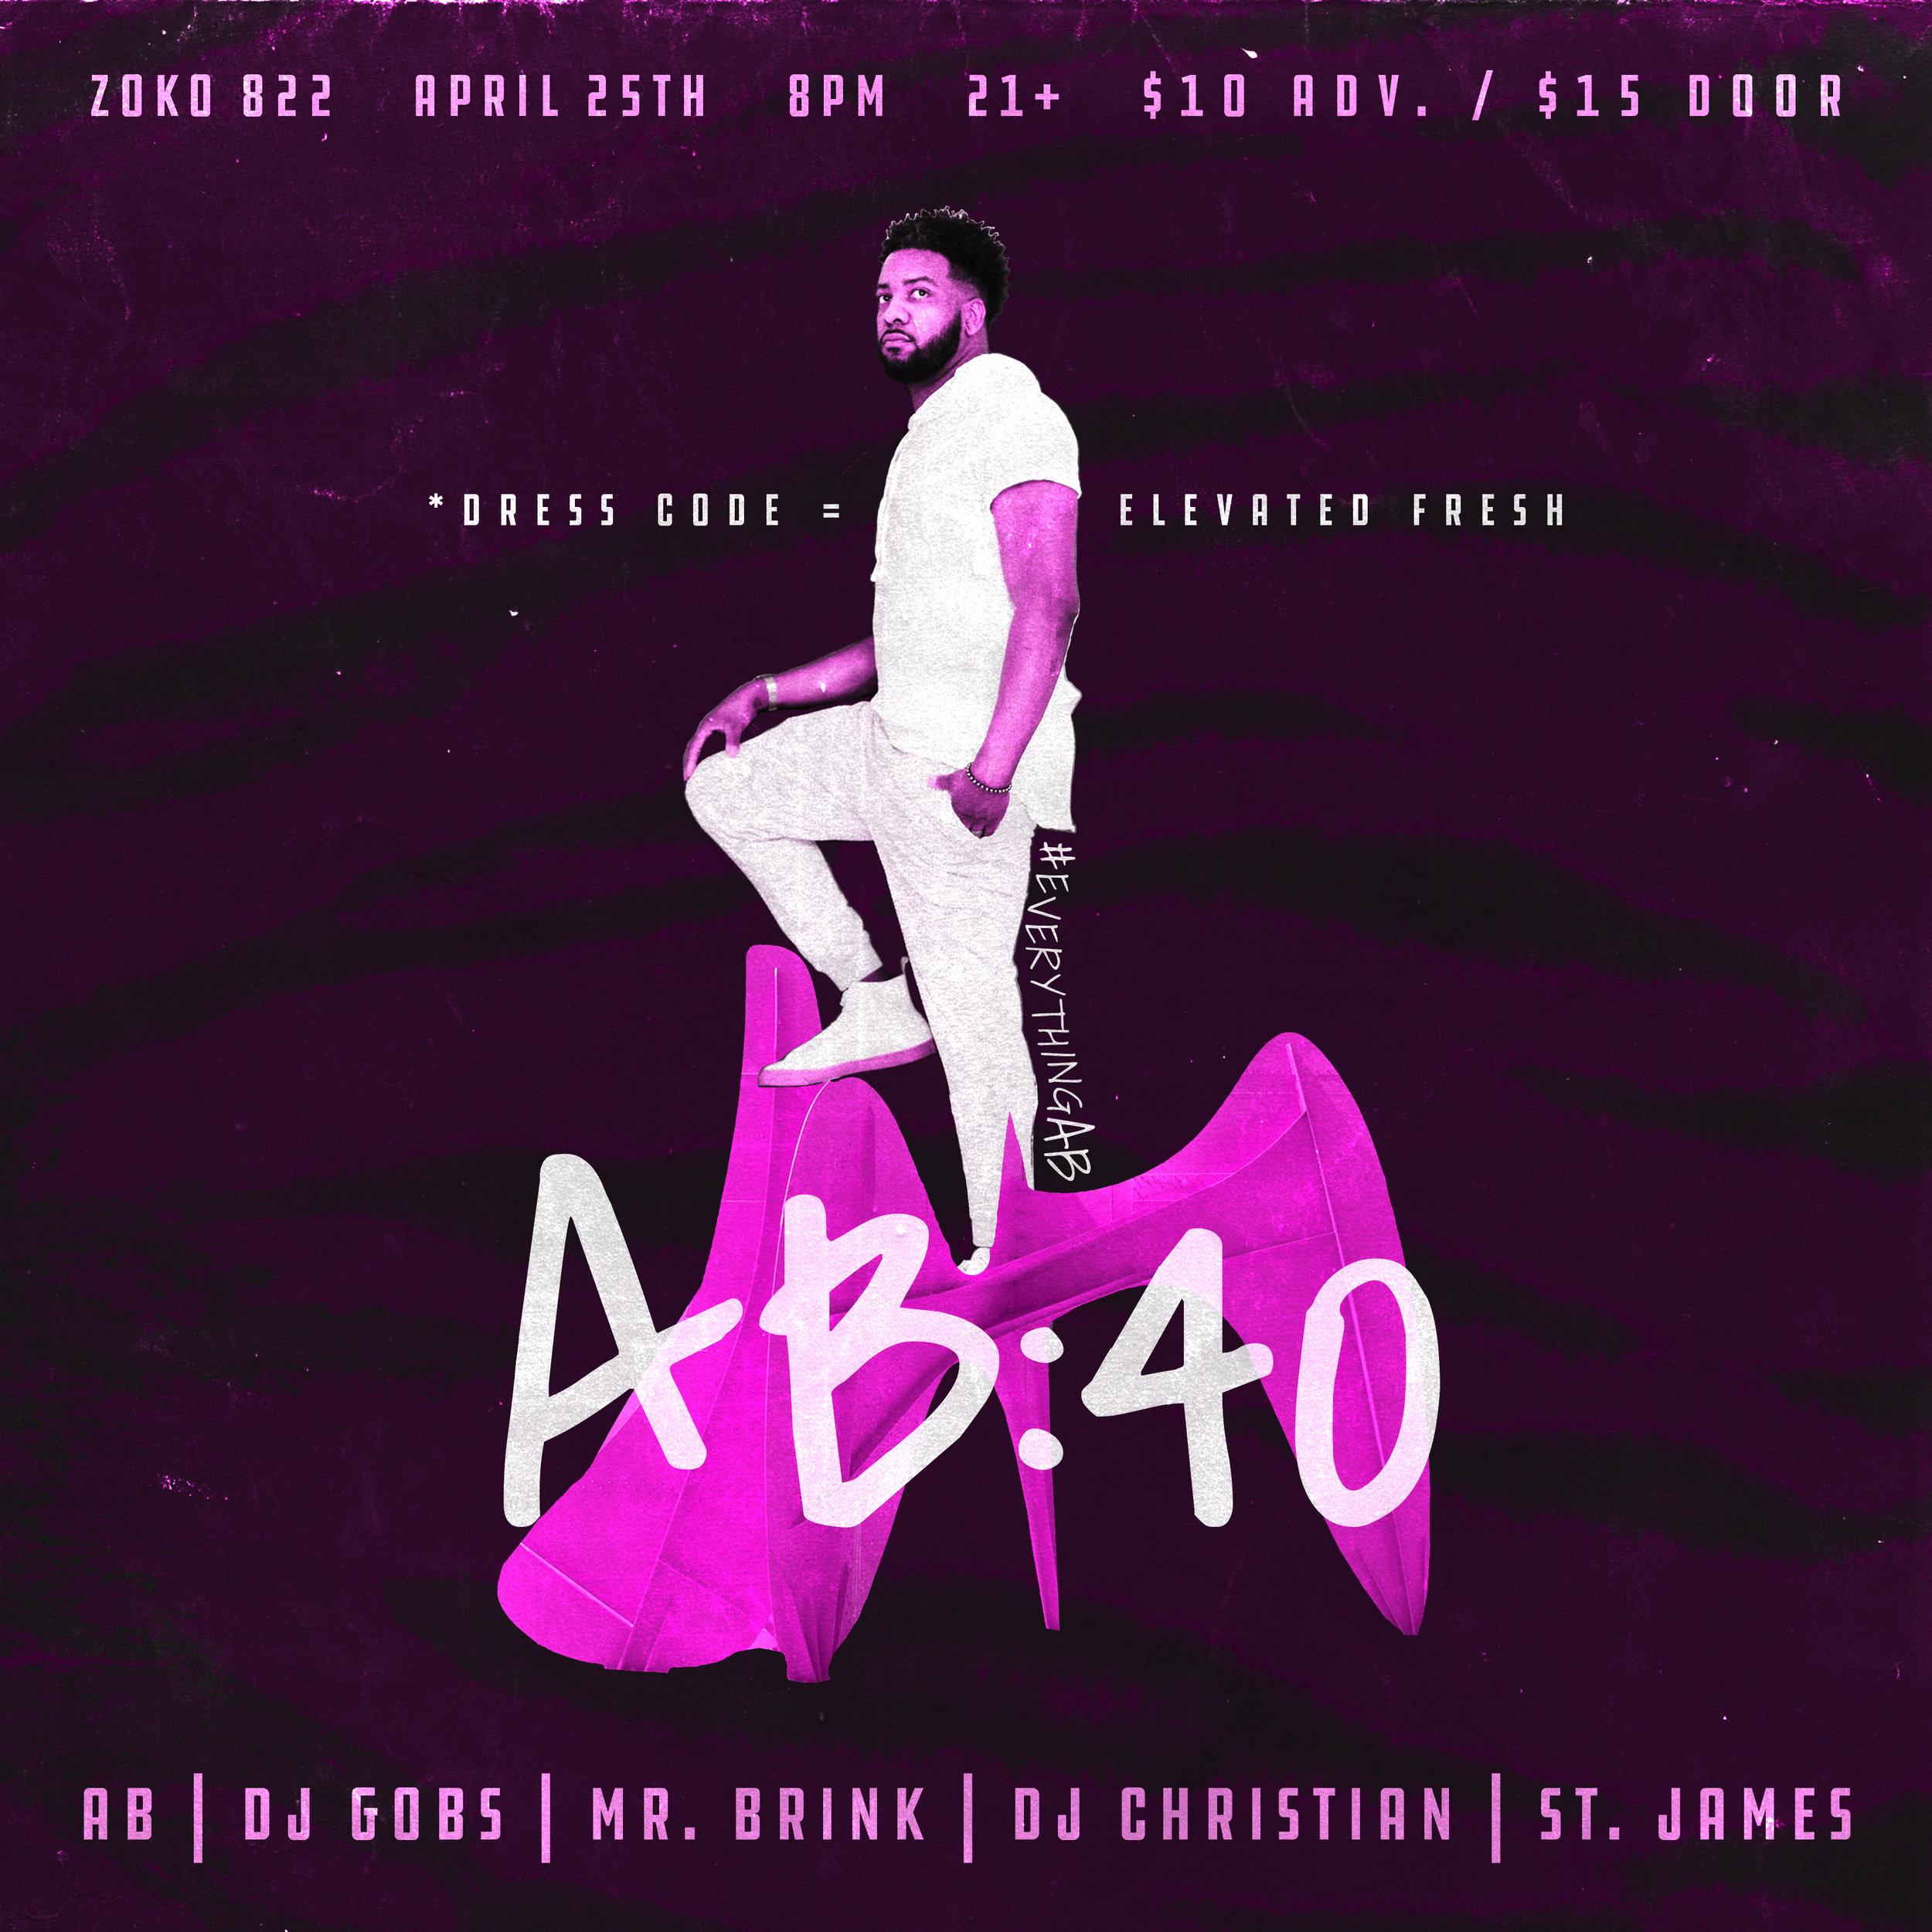 AB 40 square.jpg